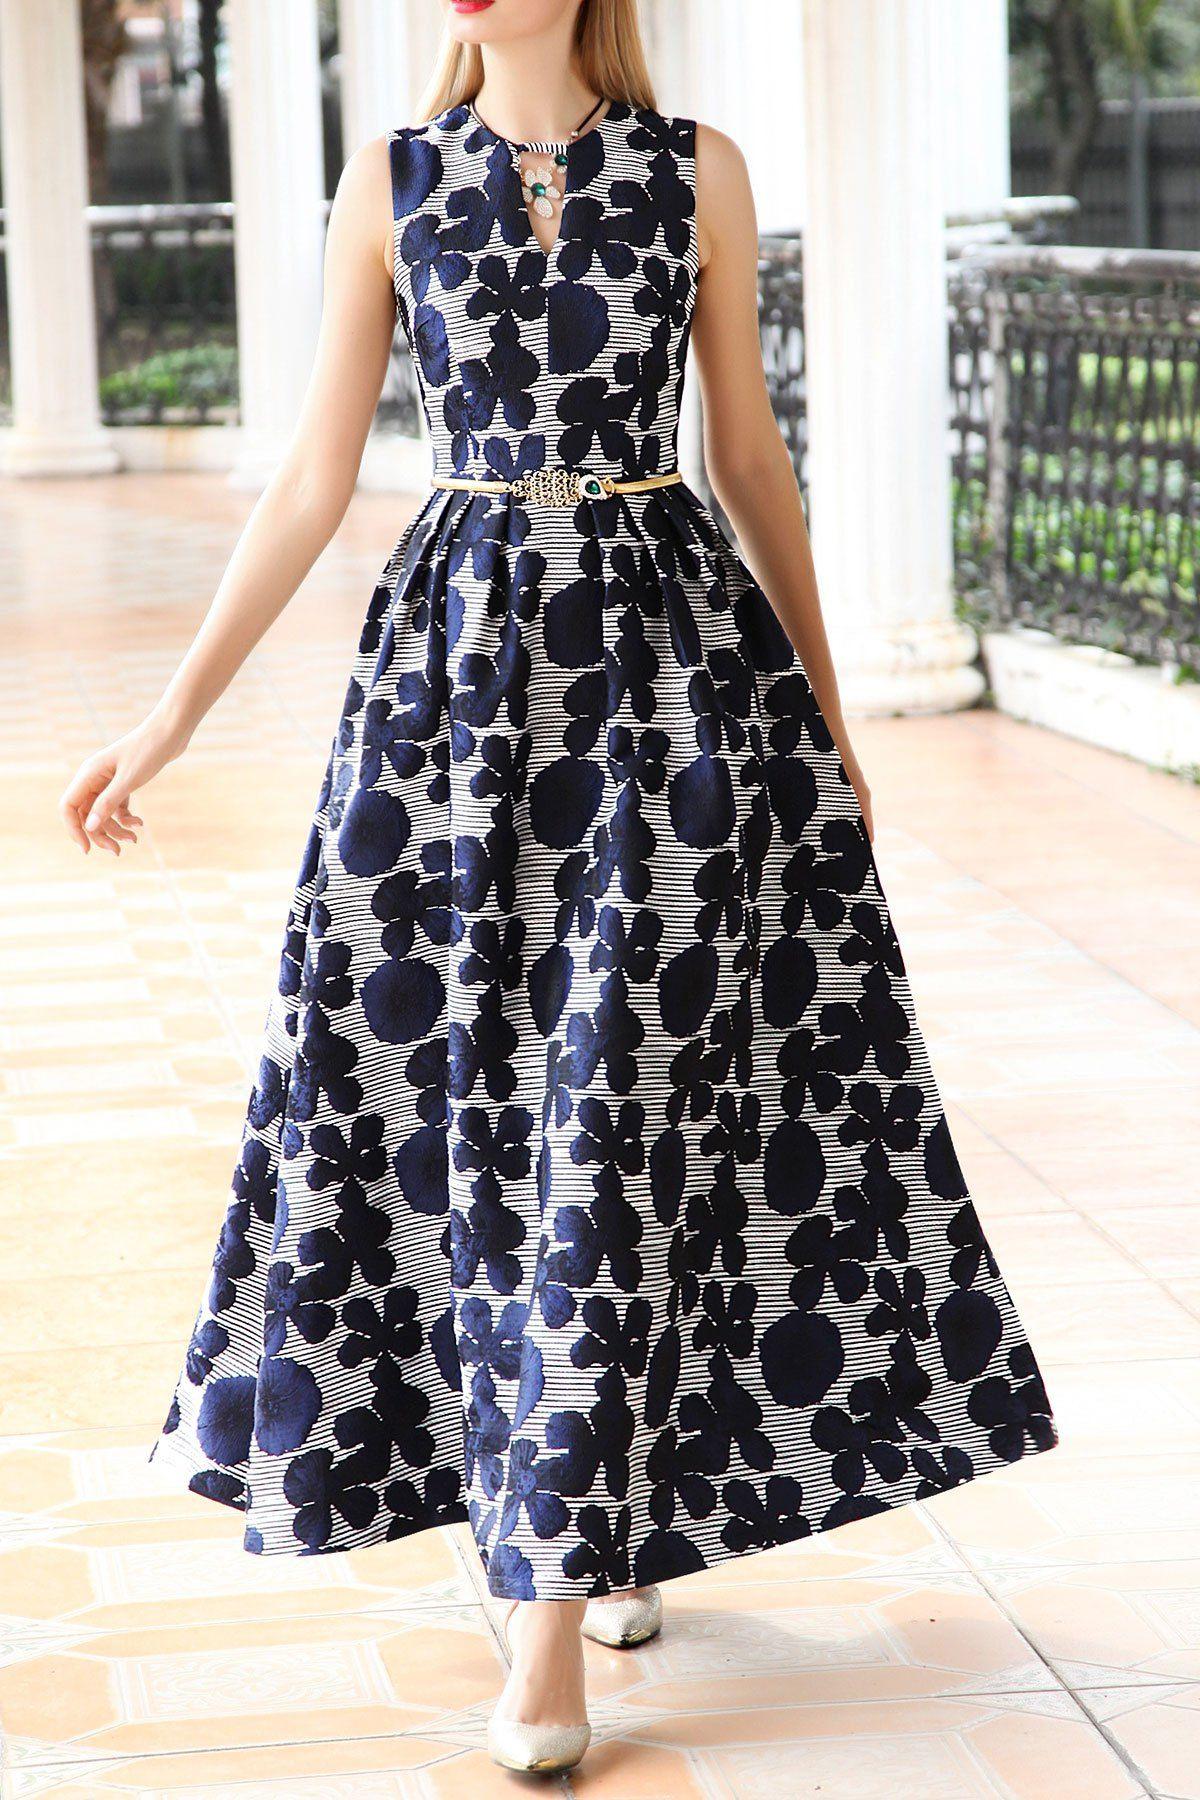 Blue floral dress dresses pinterest blue floral dresses